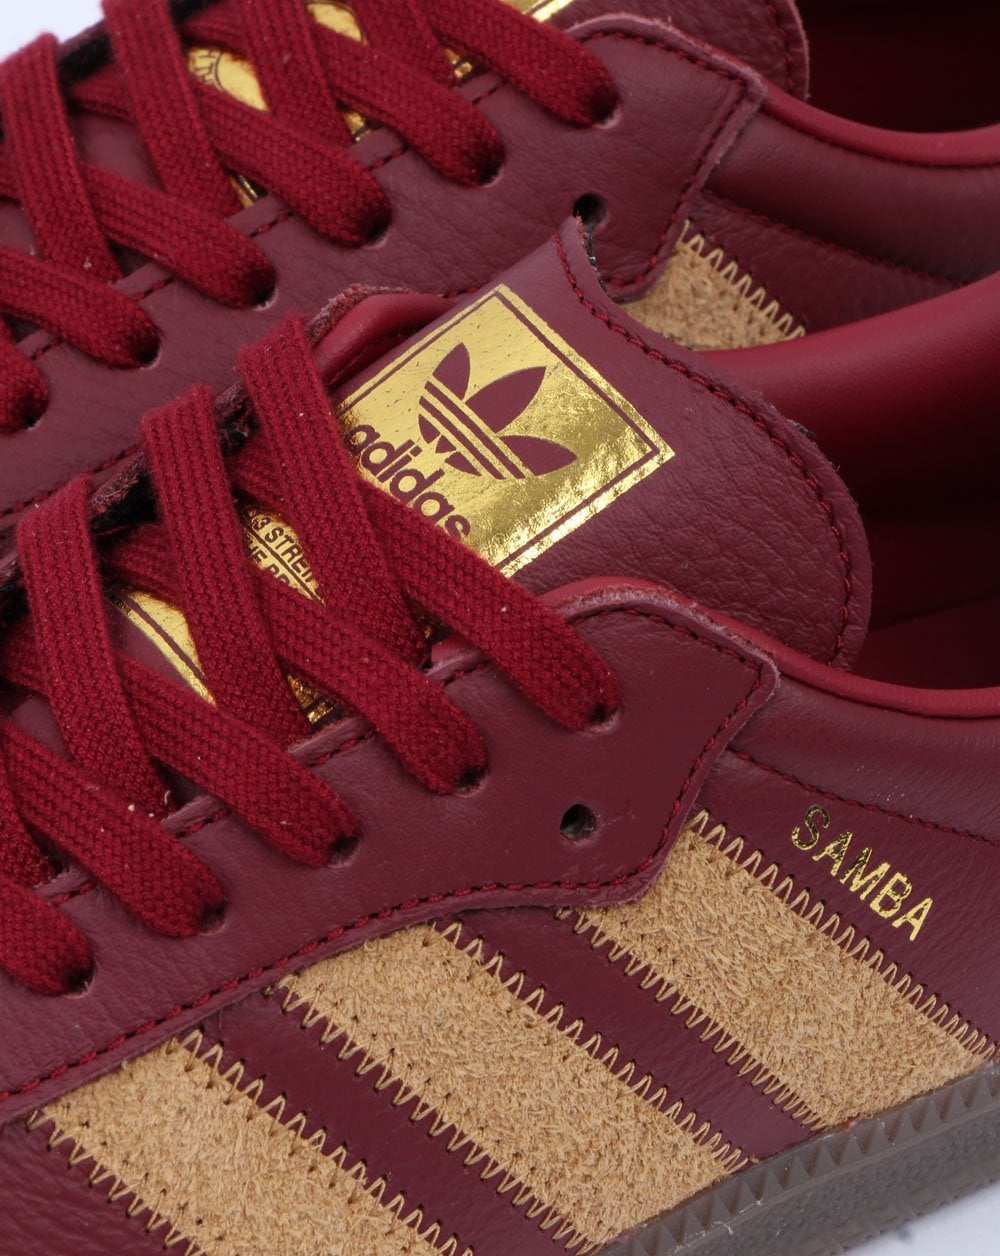 Descortés fuente Sarabo árabe  Adidas Samba Og Ft Trainers Burgundy/Gold - 80s Casual Classics